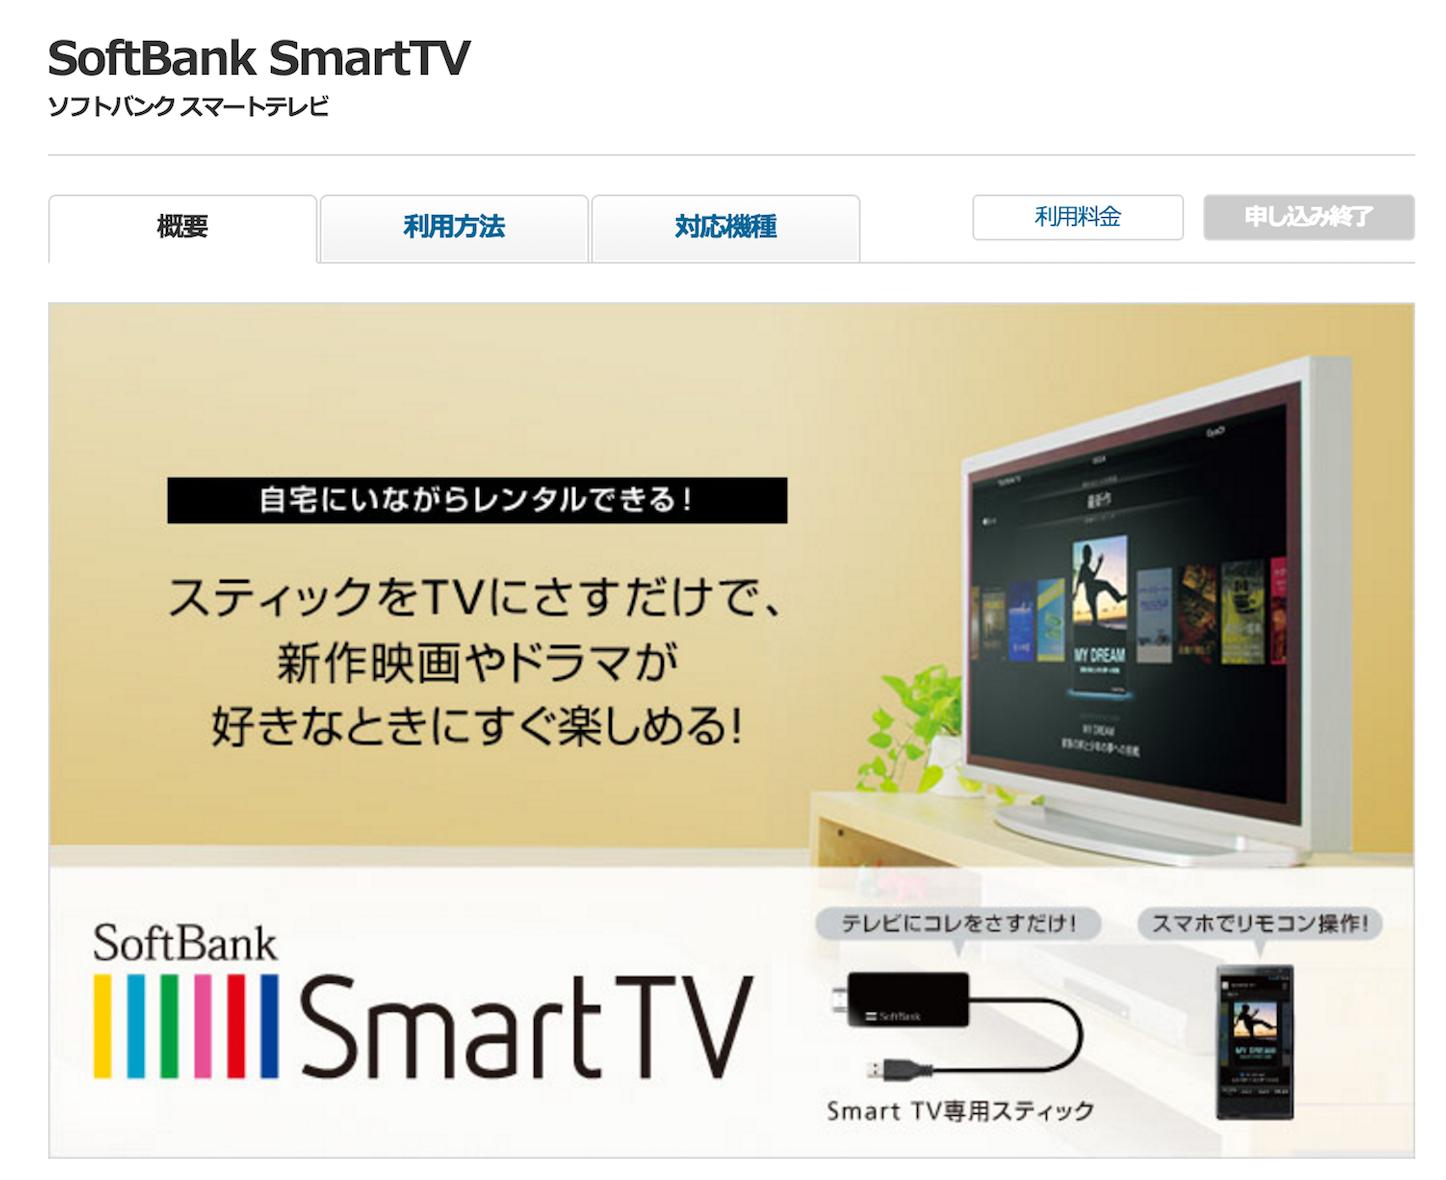 Softbank Smart TV